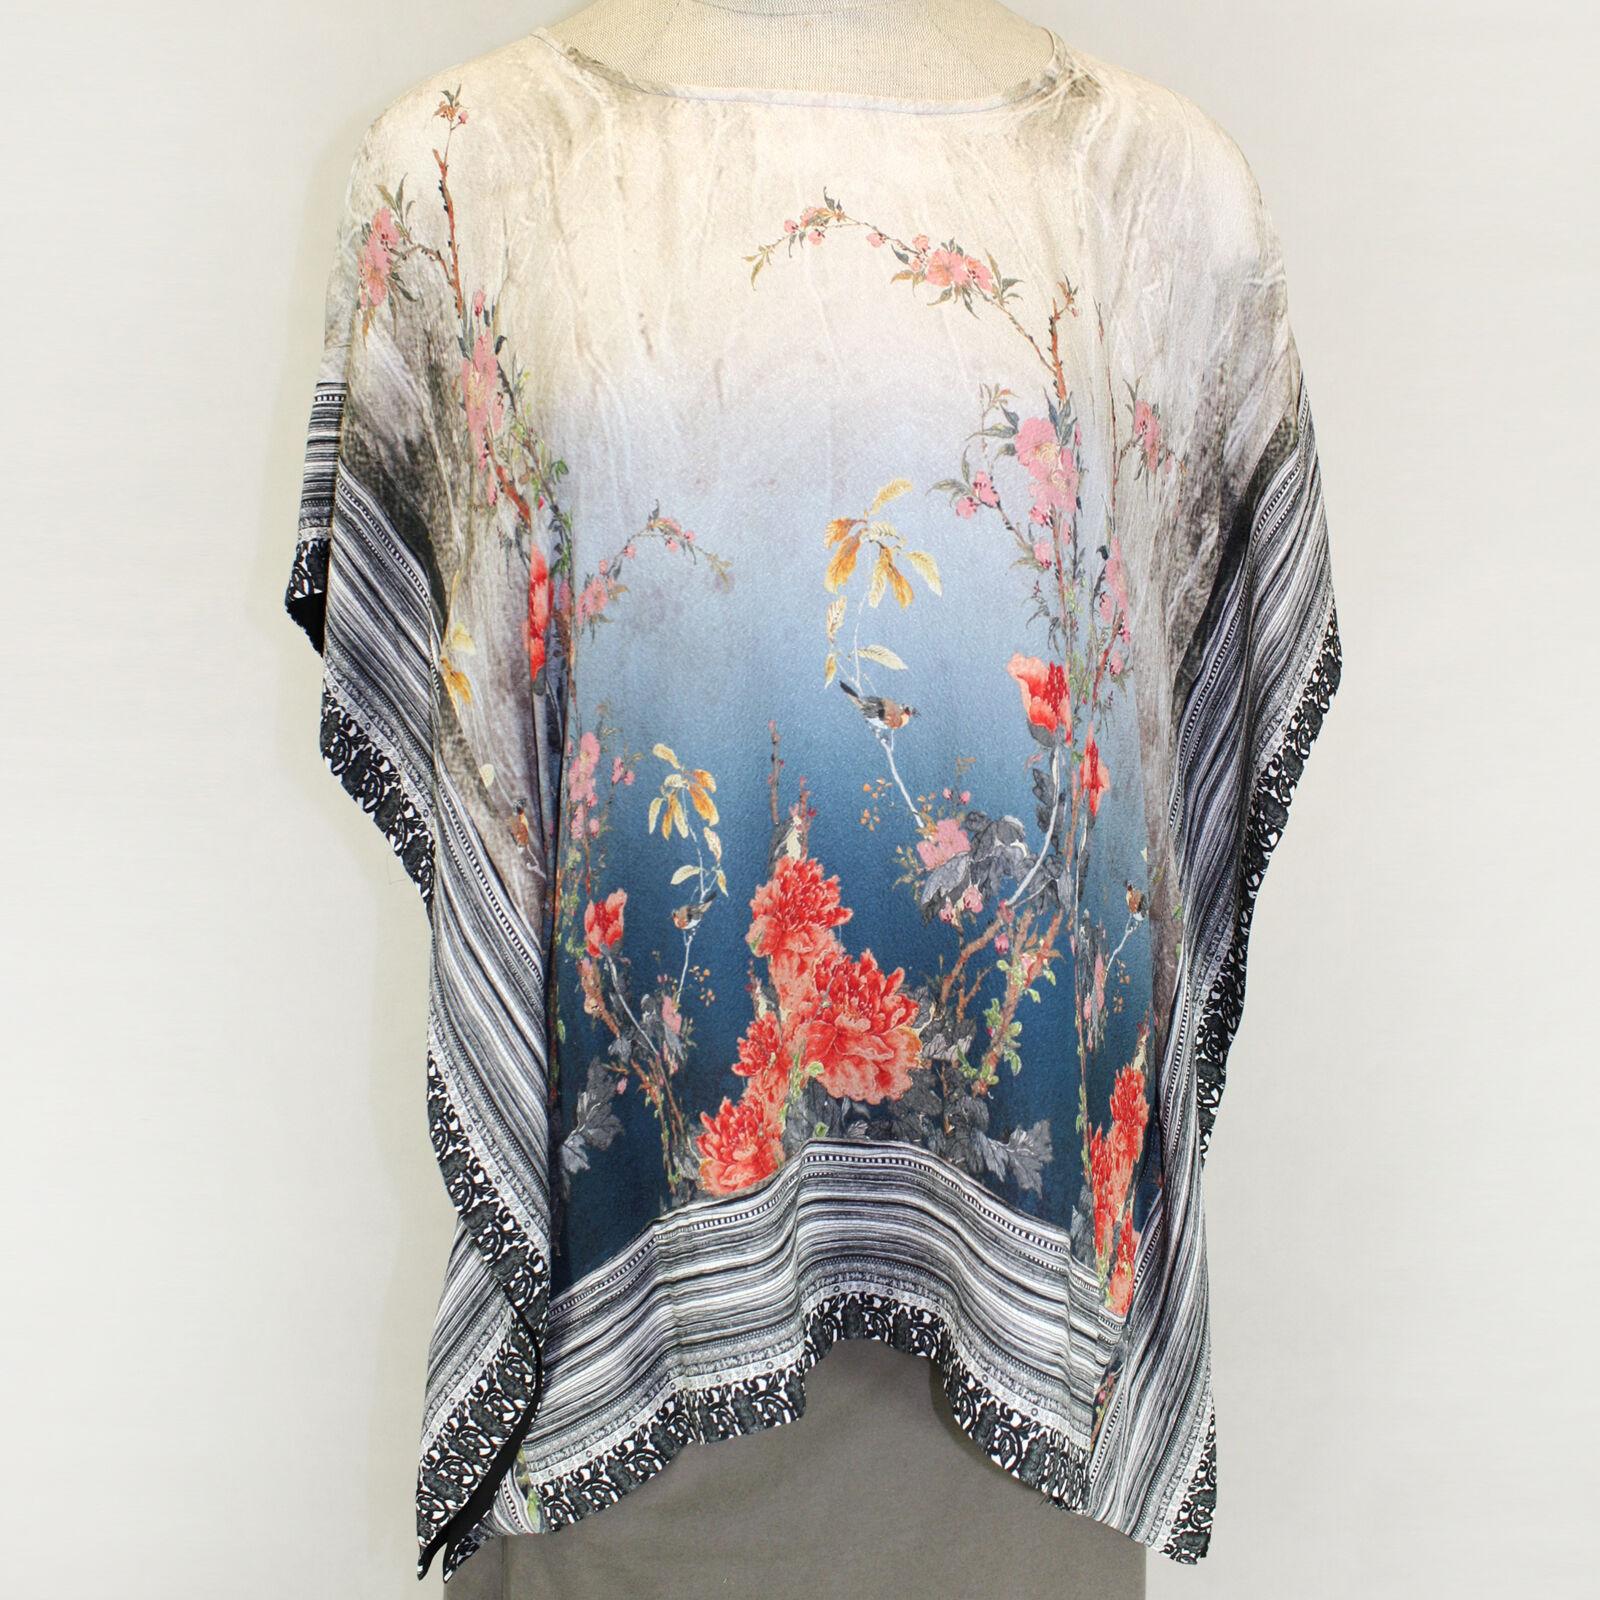 Citron Clothing 100% Silk Art To Wear Birds Blooms Fukure Tunic Blouse Plus 1X